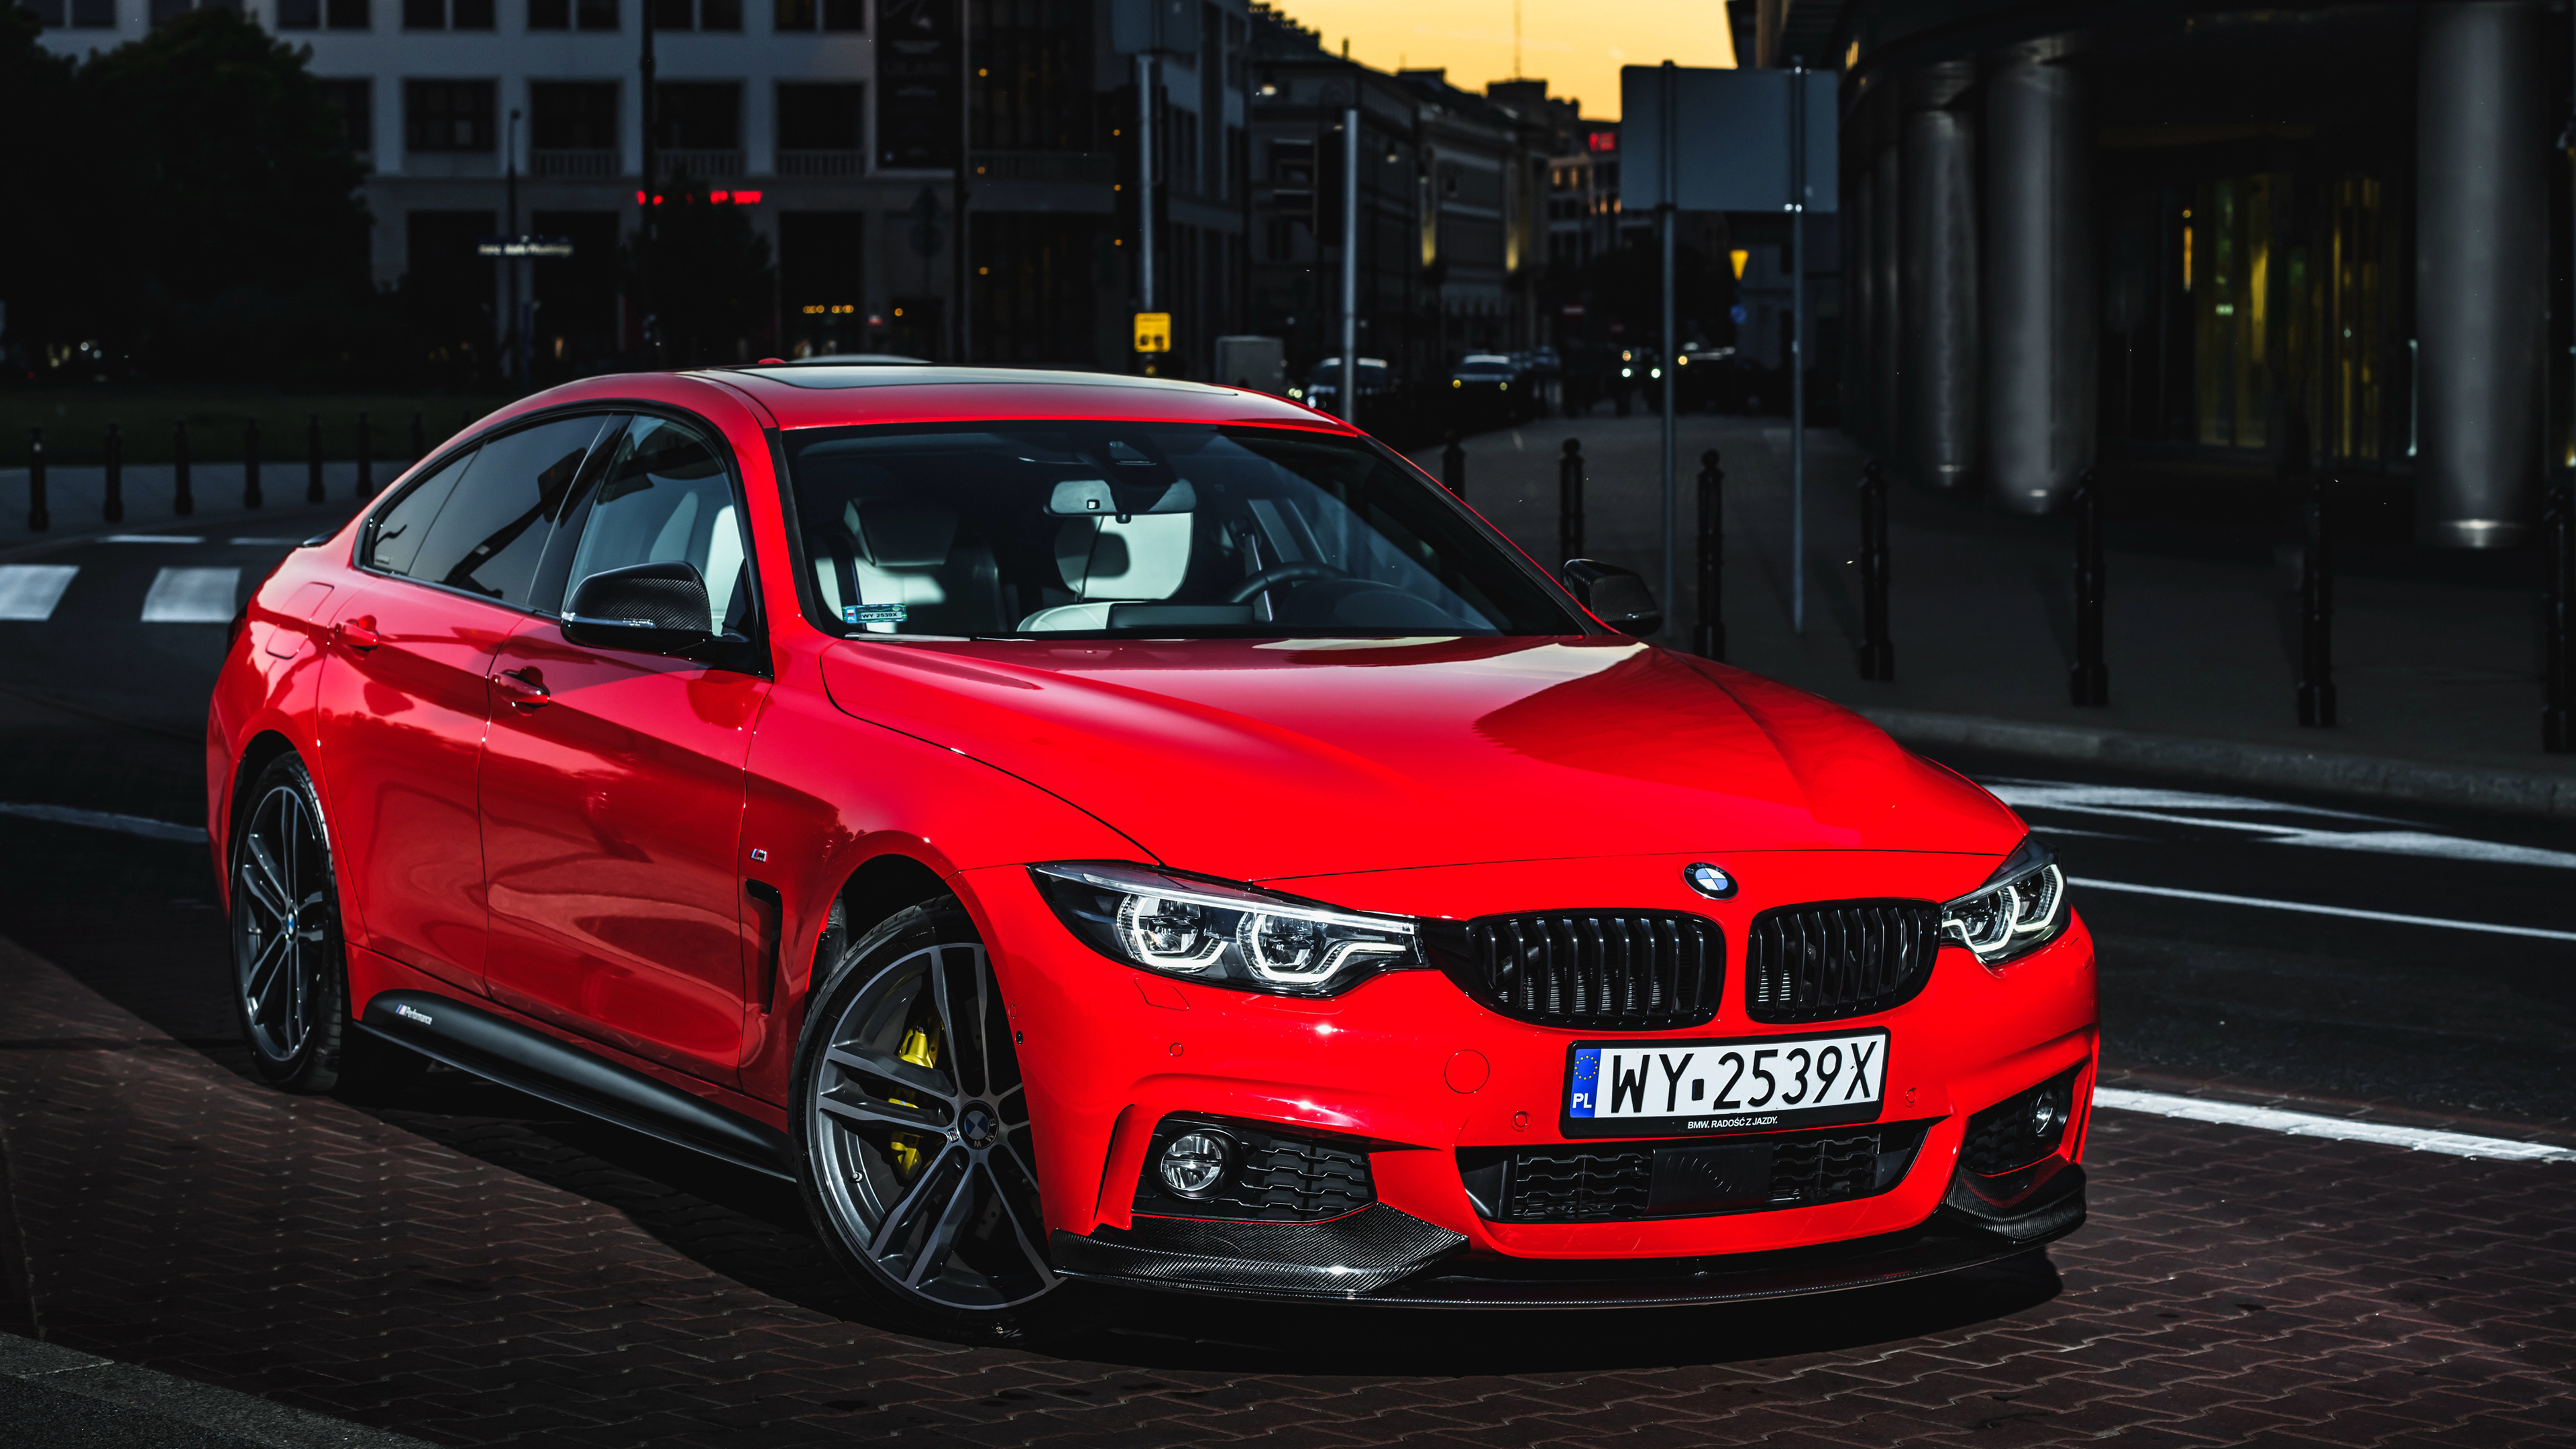 2018 bmw 430i gran coupe m performance parts 1539112046 - 2018 BMW 430i Gran Coupe M Performance Parts - hd-wallpapers, cars wallpapers, bmw wallpapers, bmw 430i wallpapers, 4k-wallpapers, 2018 cars wallpapers